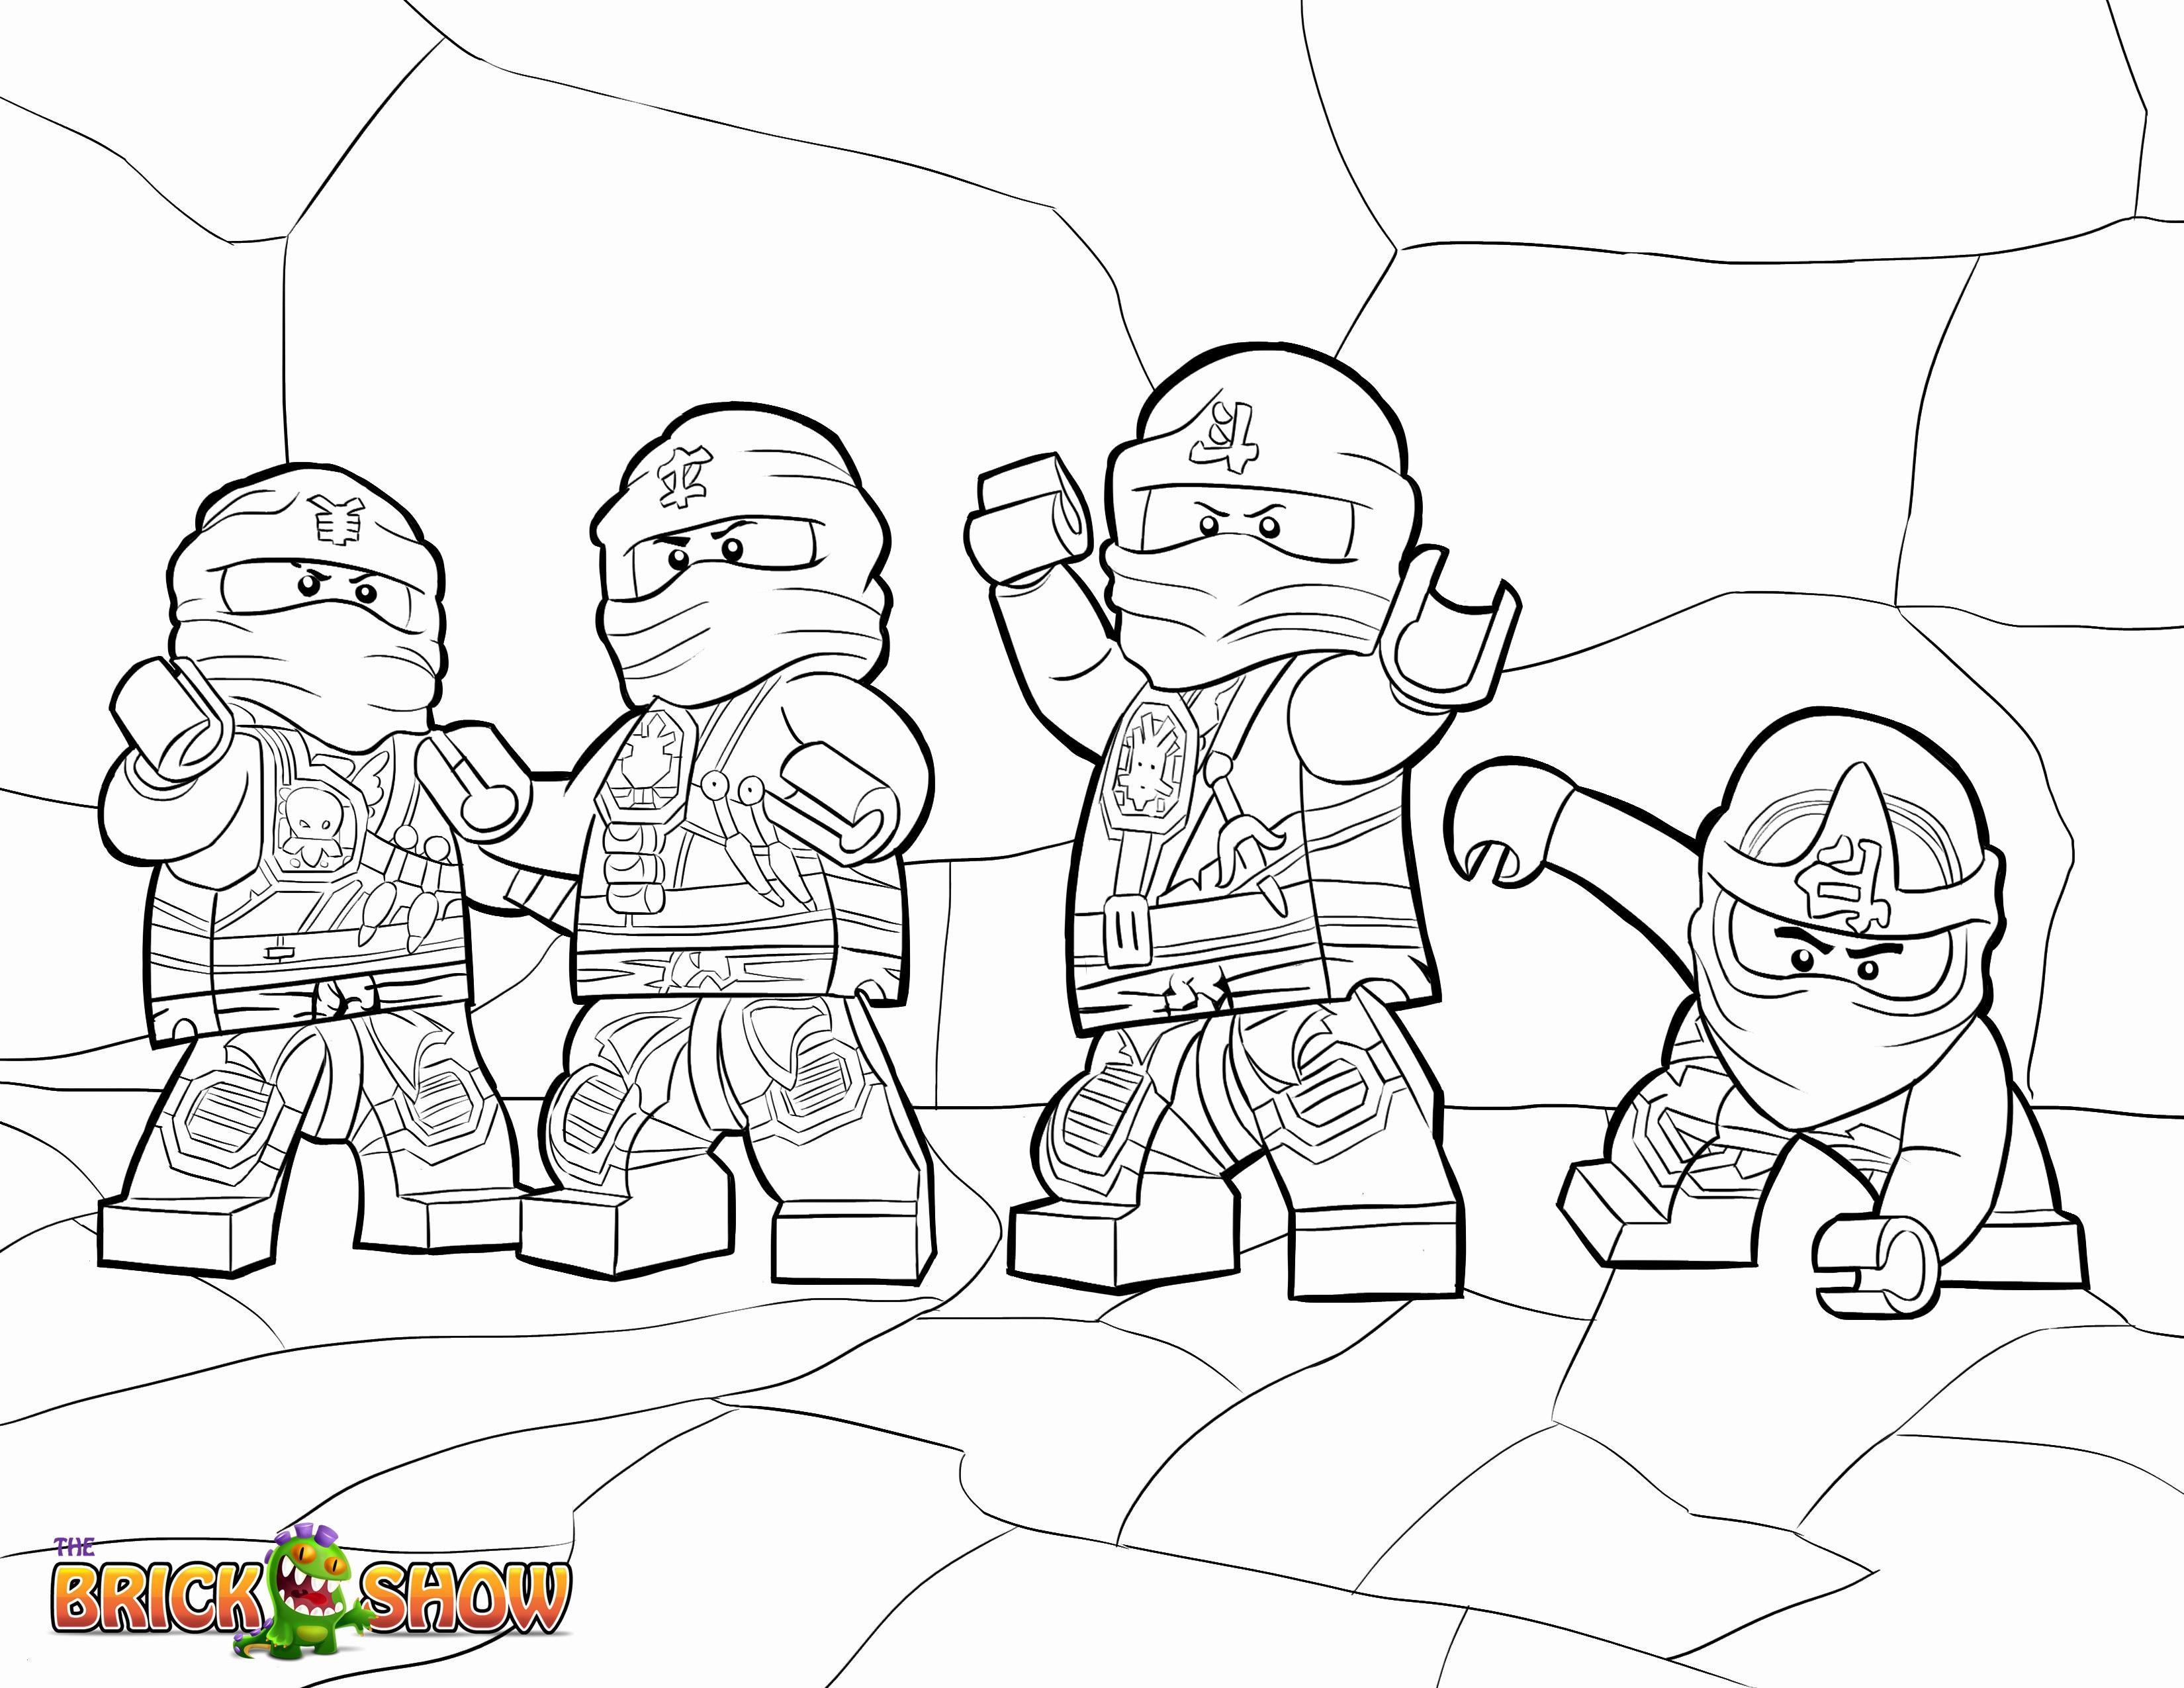 Ninjago Jay Ausmalbild Frisch Lego Ninjago Coloring Pages Free Coloring Pages Inspirierend Ninjago Das Bild